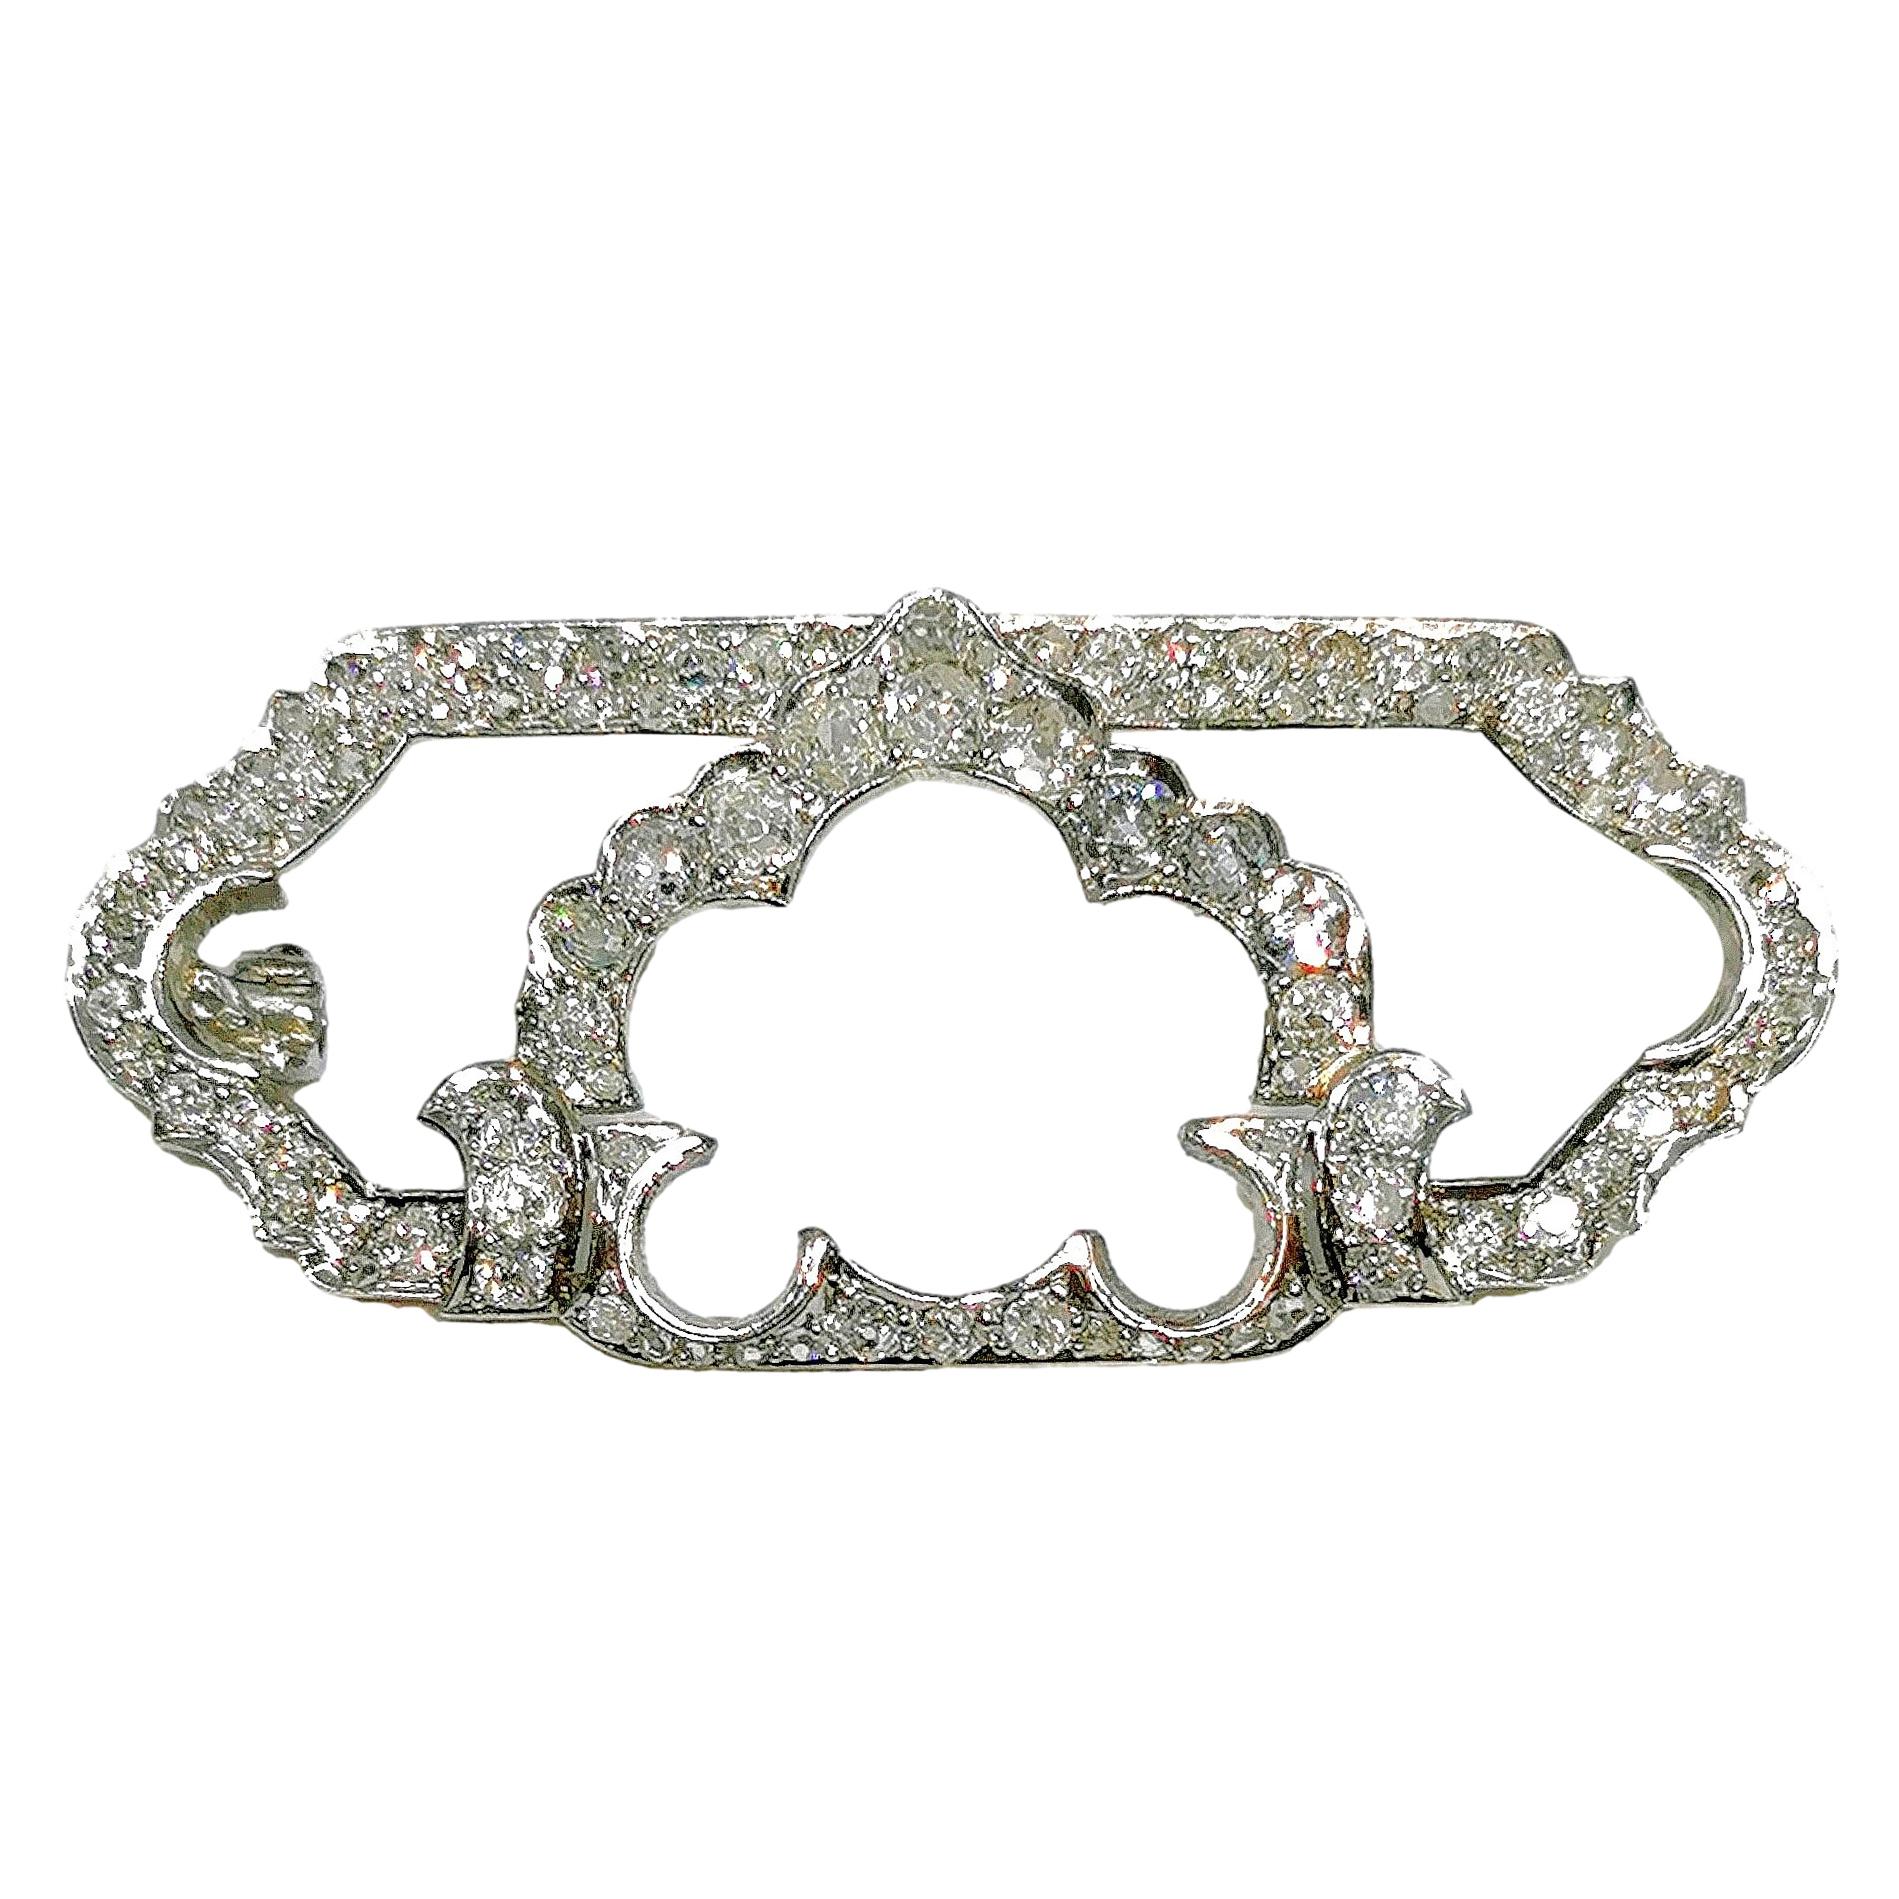 Bespoke diamond and platinum art deco brooch 1915-1920